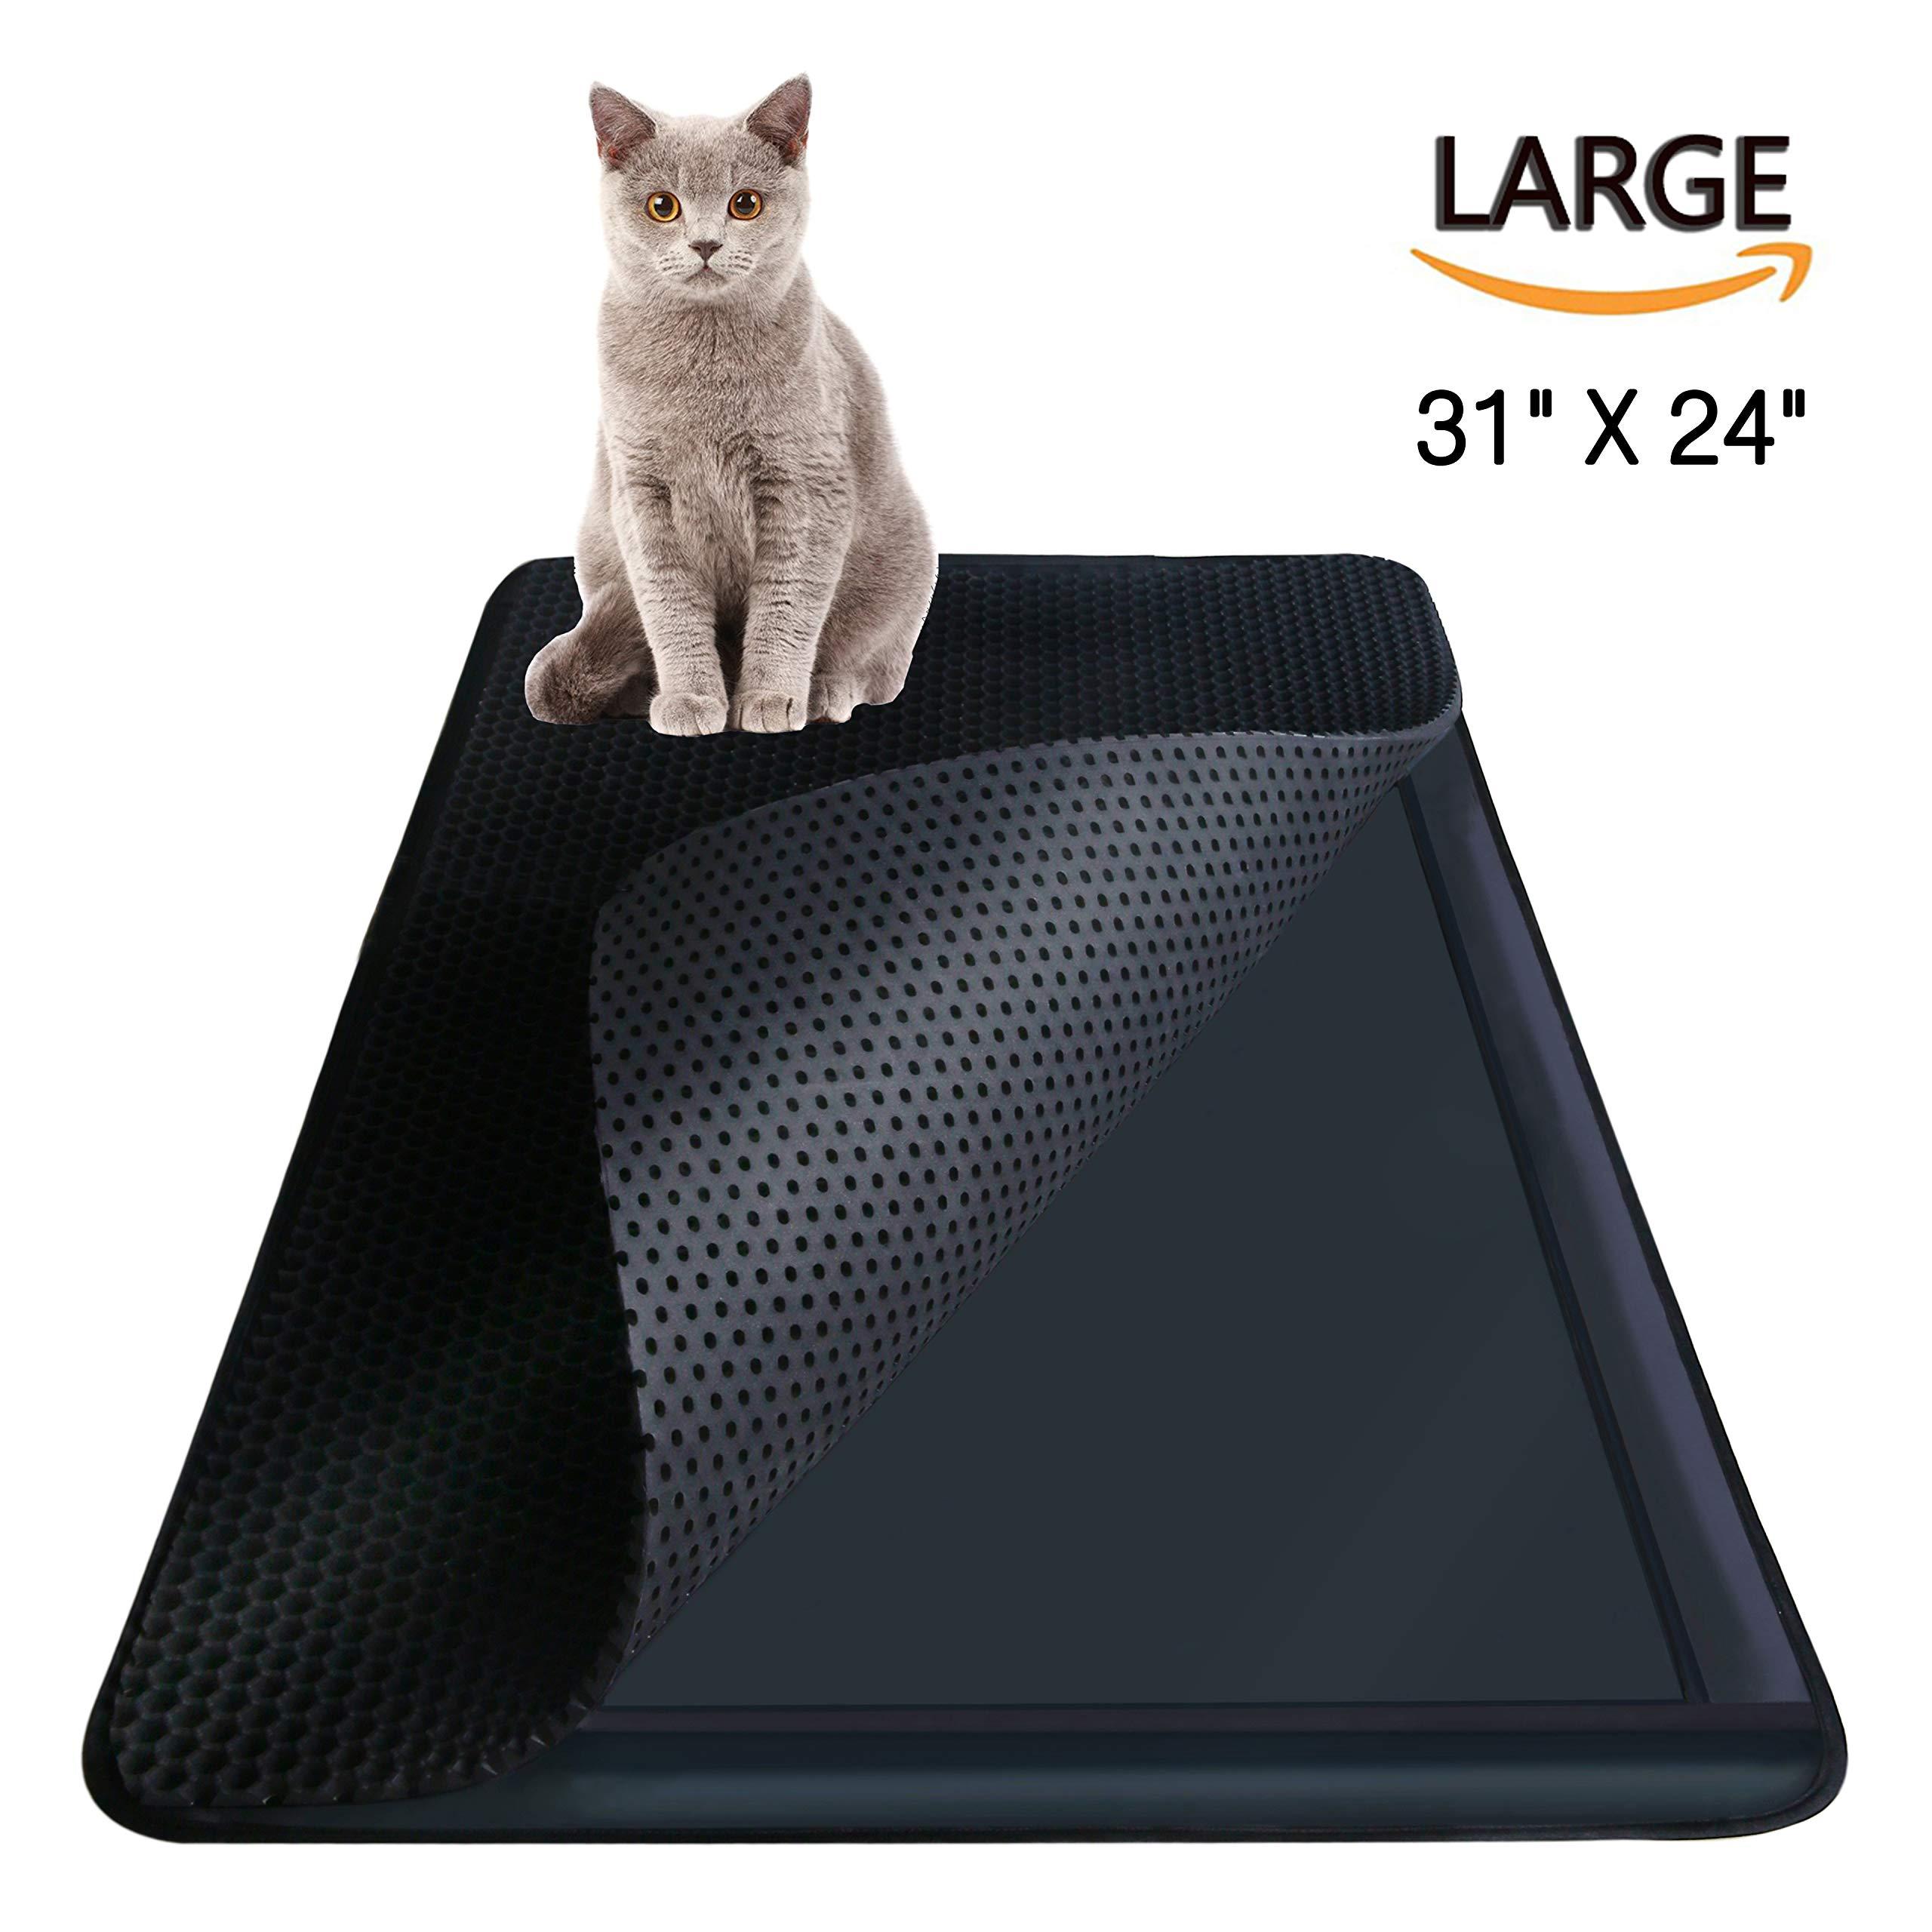 Highland Farms Select Cat Litter Mat - Cat Litter Box Trapper Cat Litter Mat Catcher - EZ Clean Large Holes - Waterproof Double Layer, Large Size 31'' X 24''